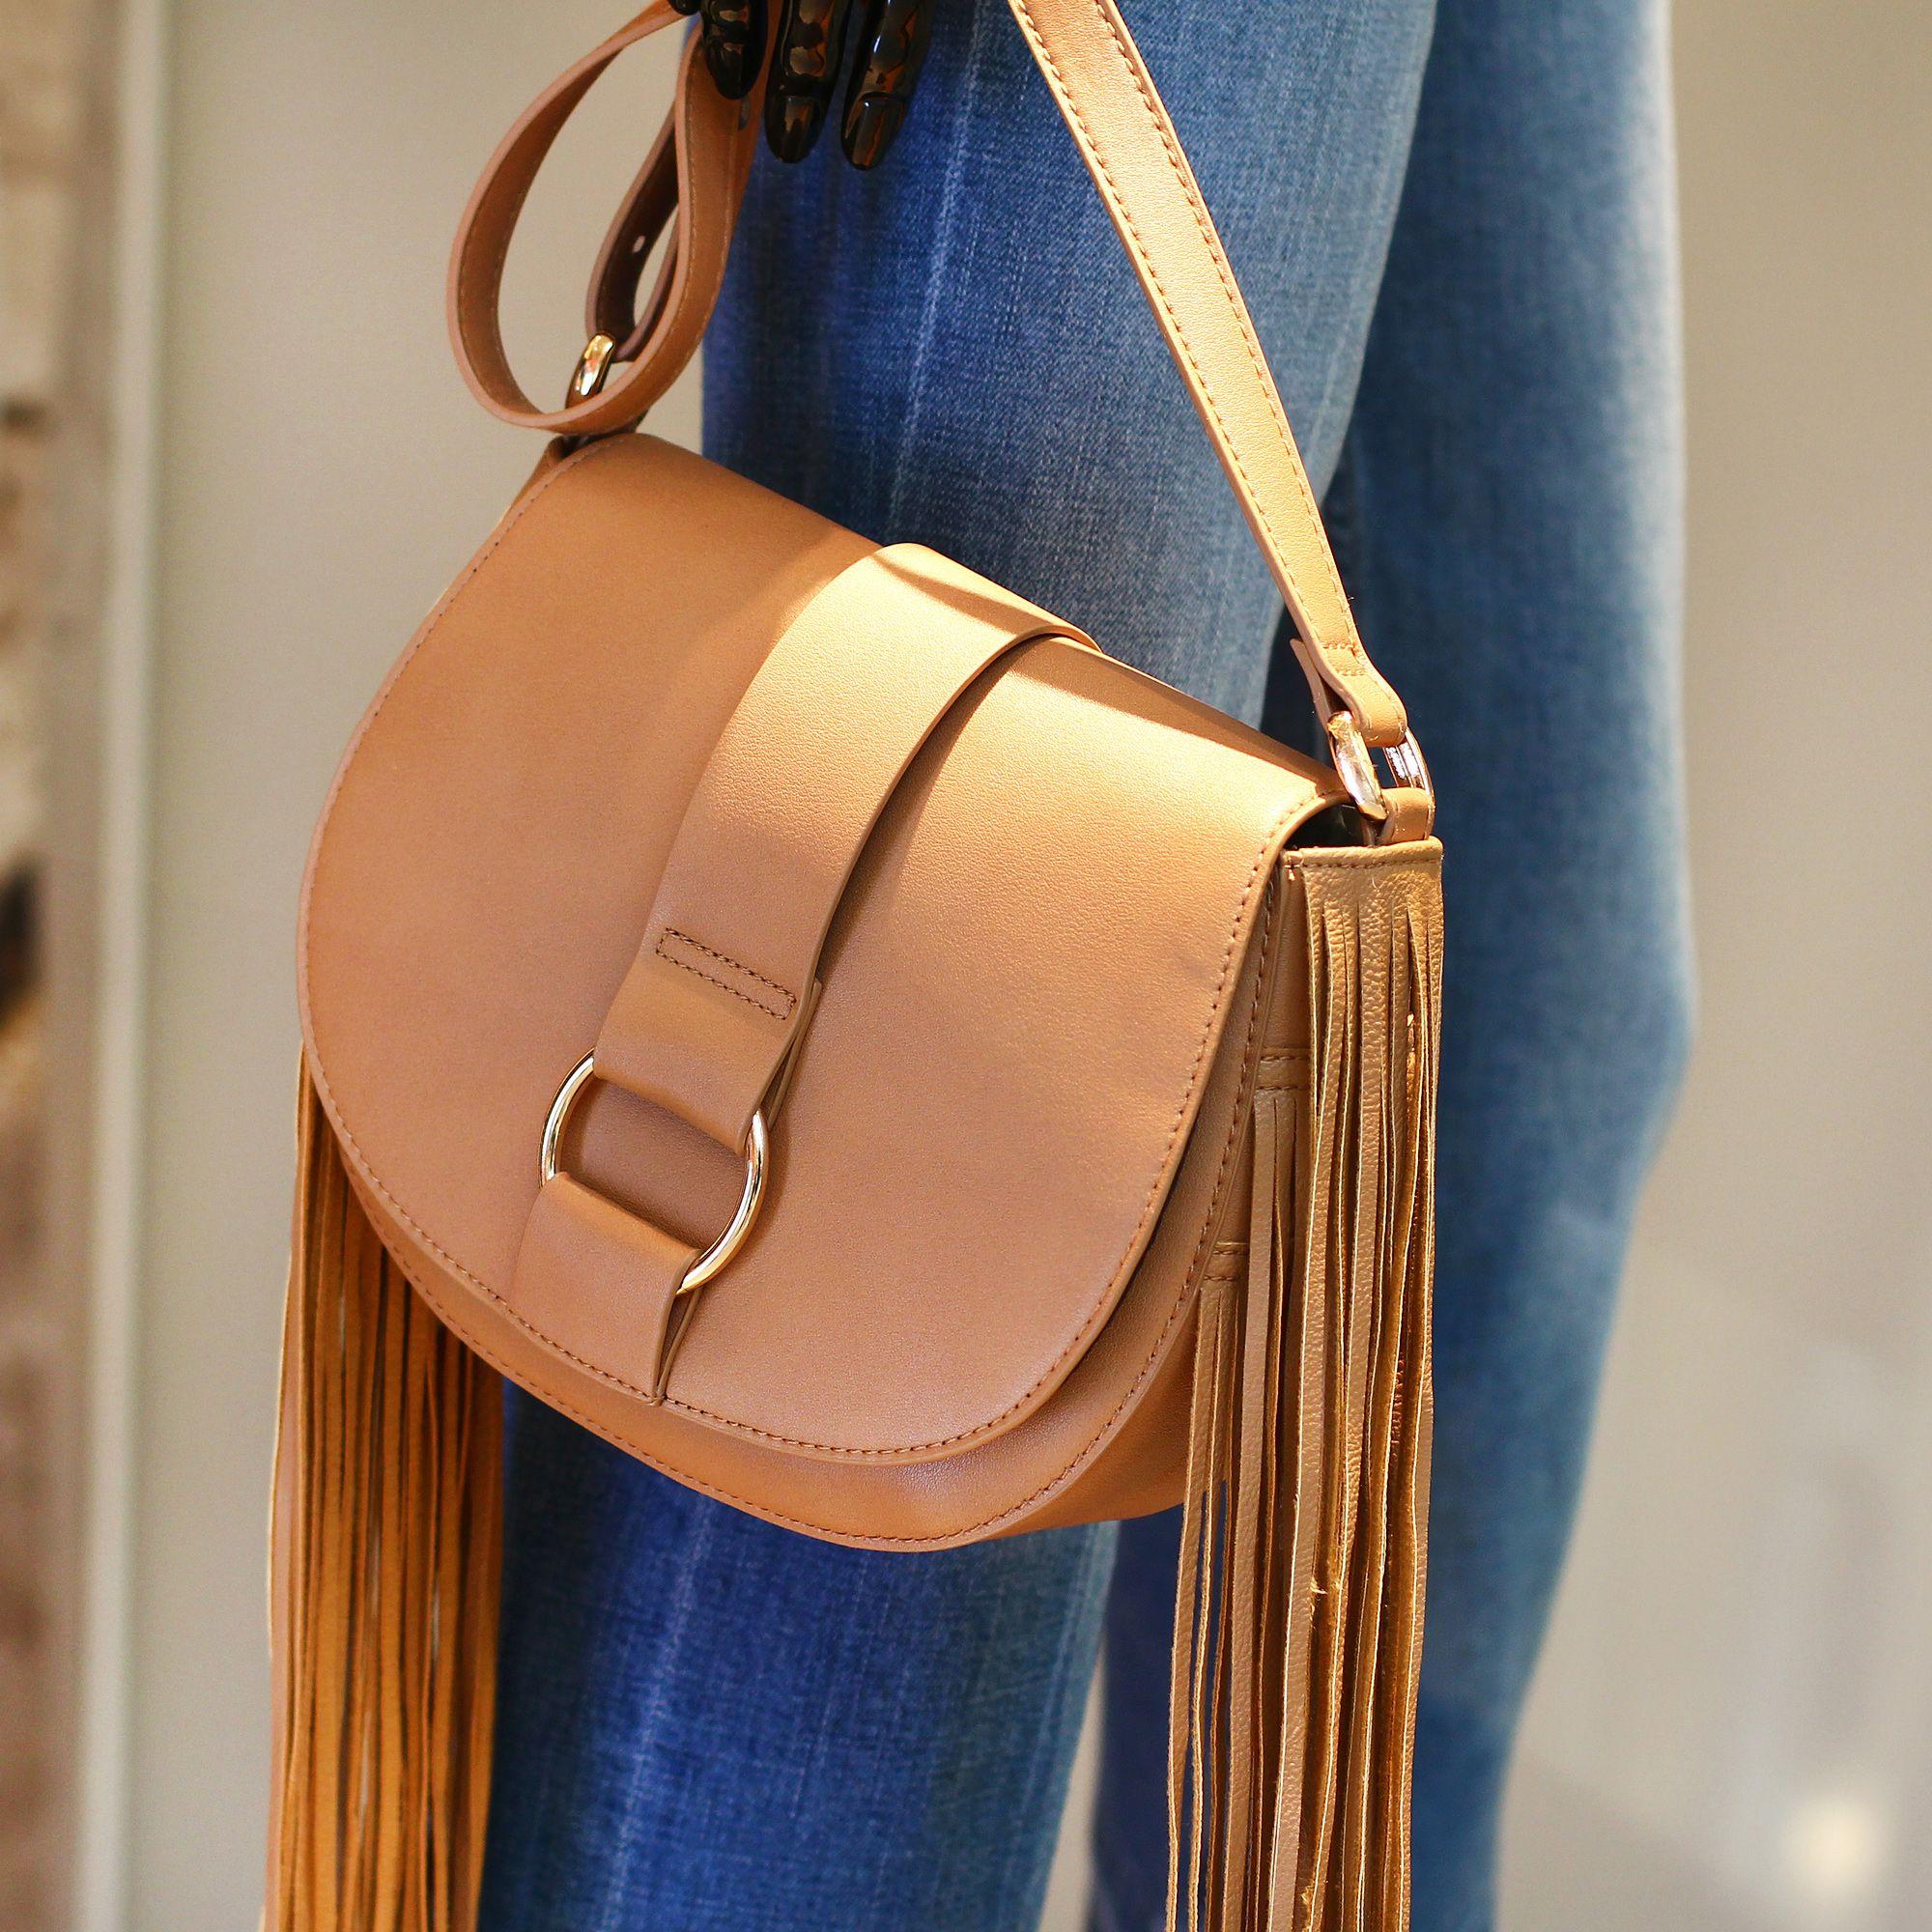 Satteltasche Von H M Thiergalerie Fashion Saddlebag Hundm Bags Instagram Saddle Bags